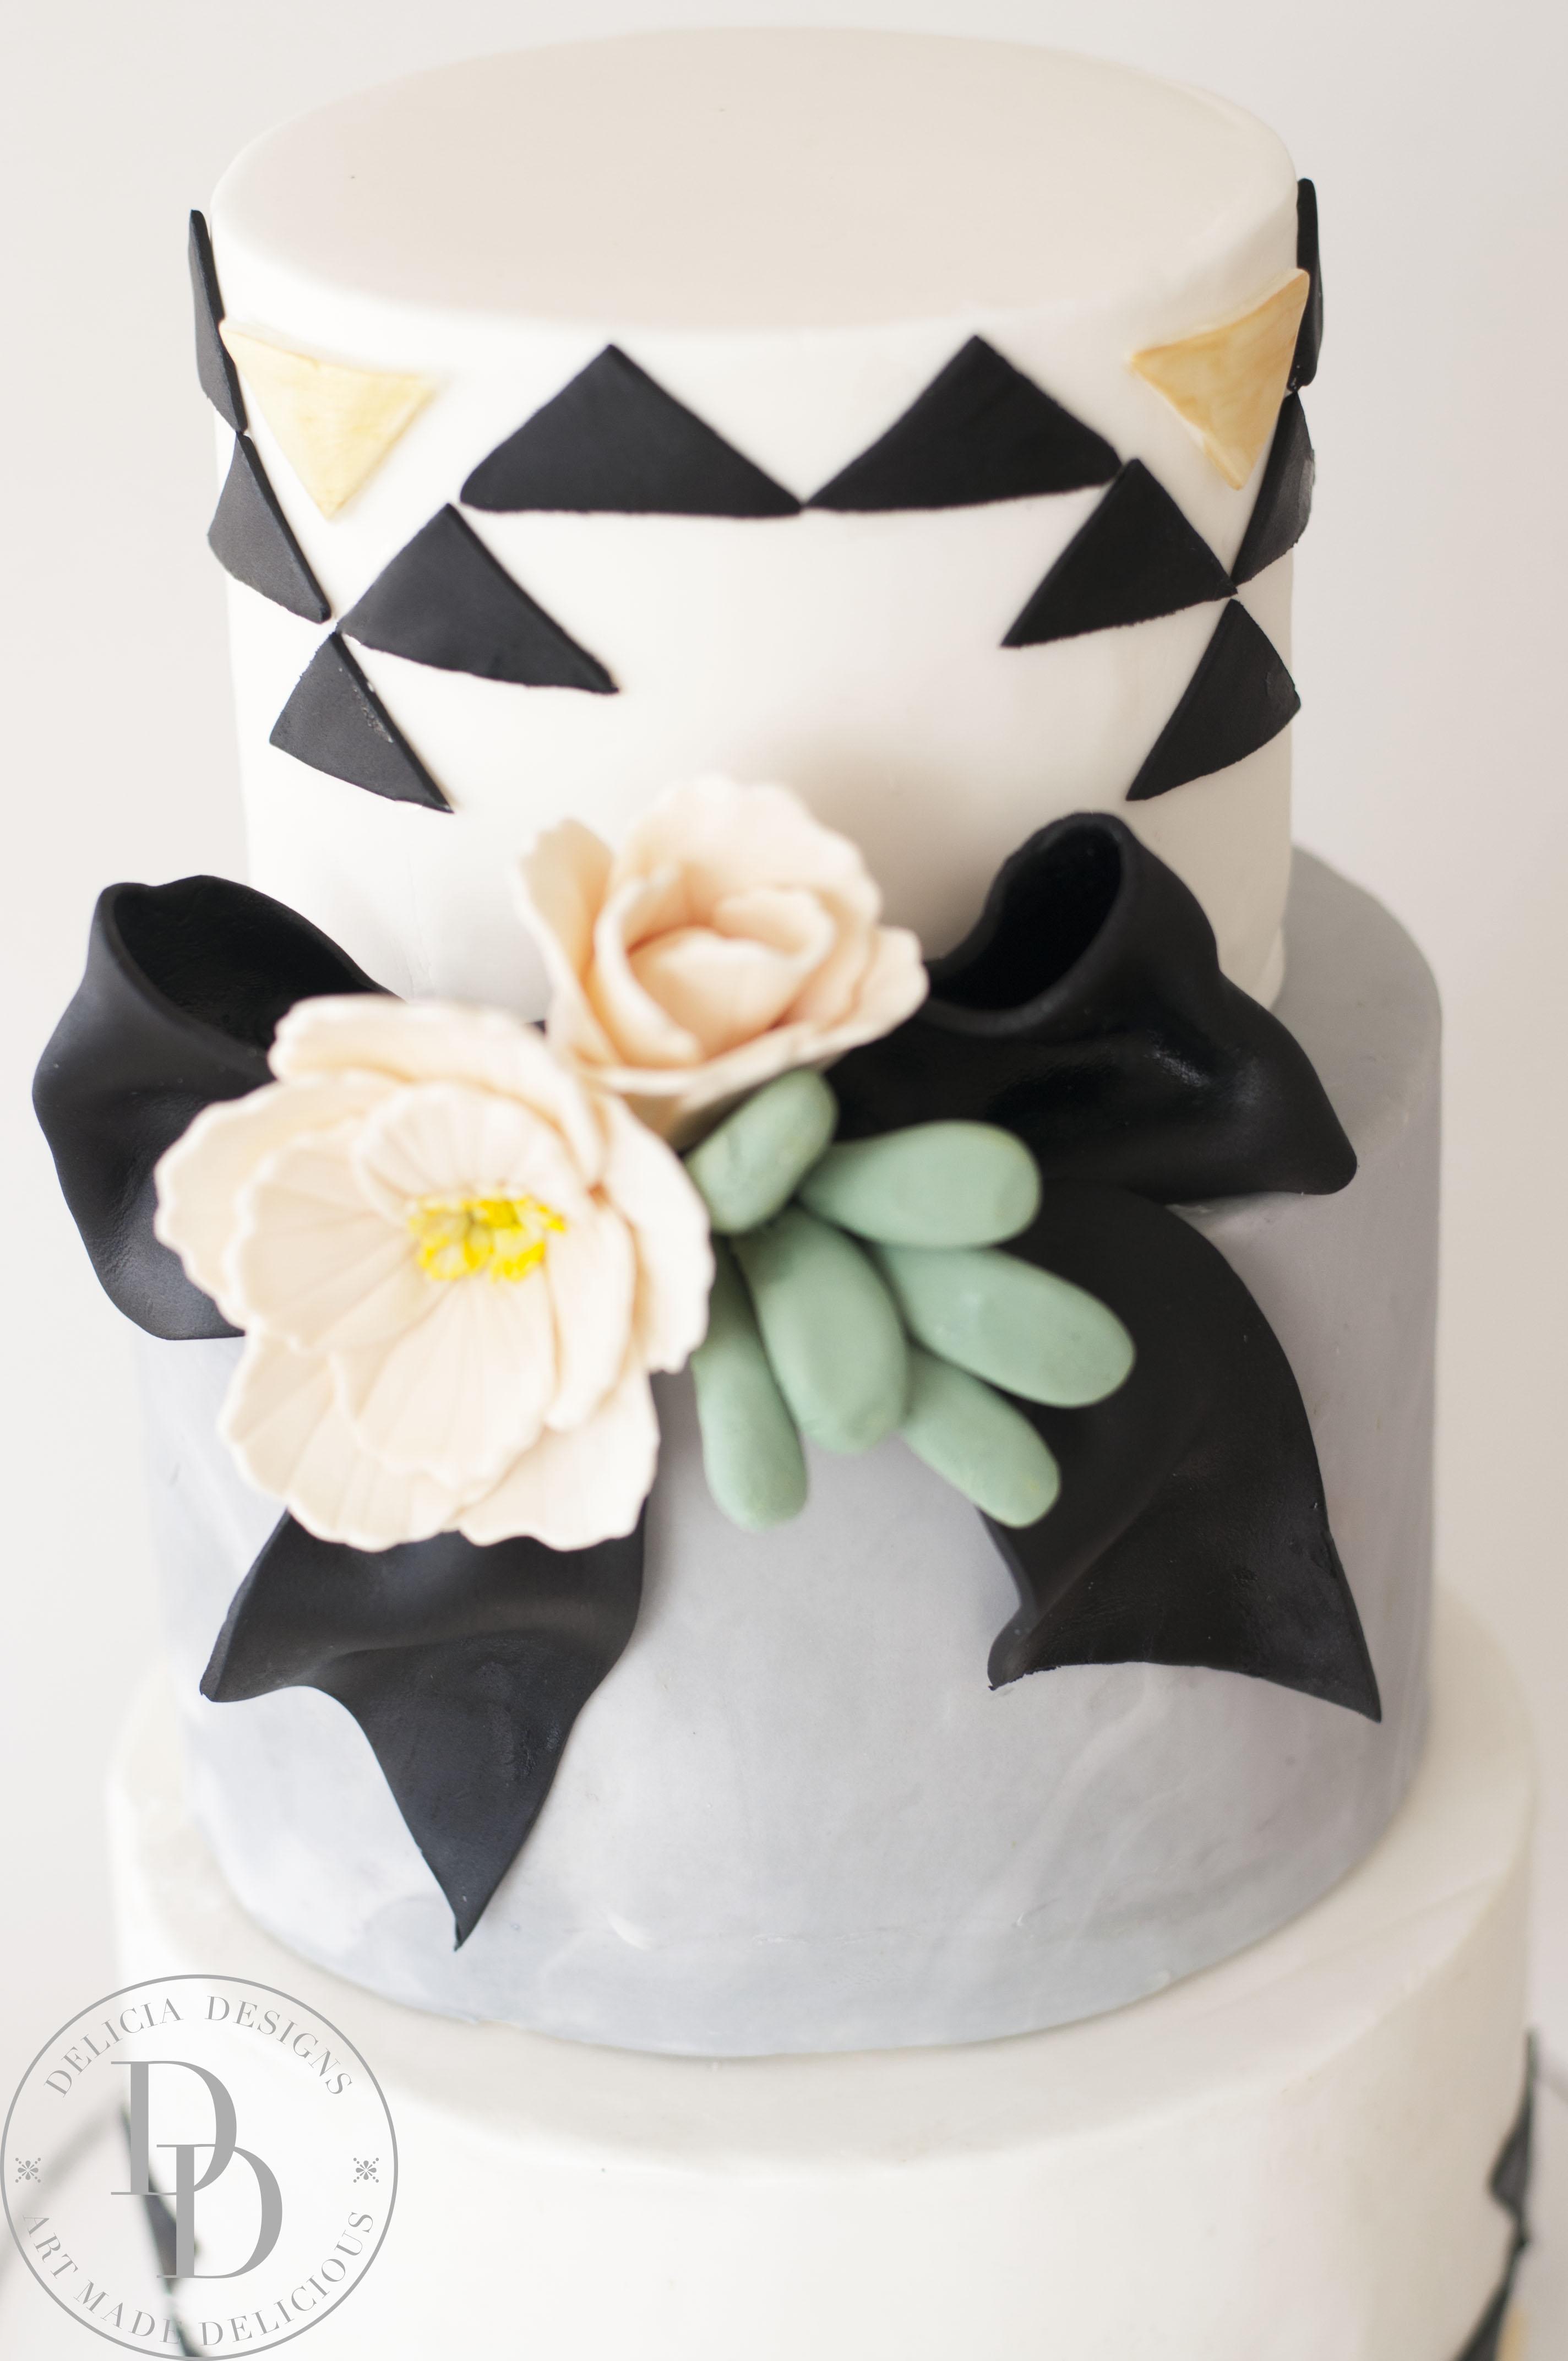 Black and white geometric wedding cake